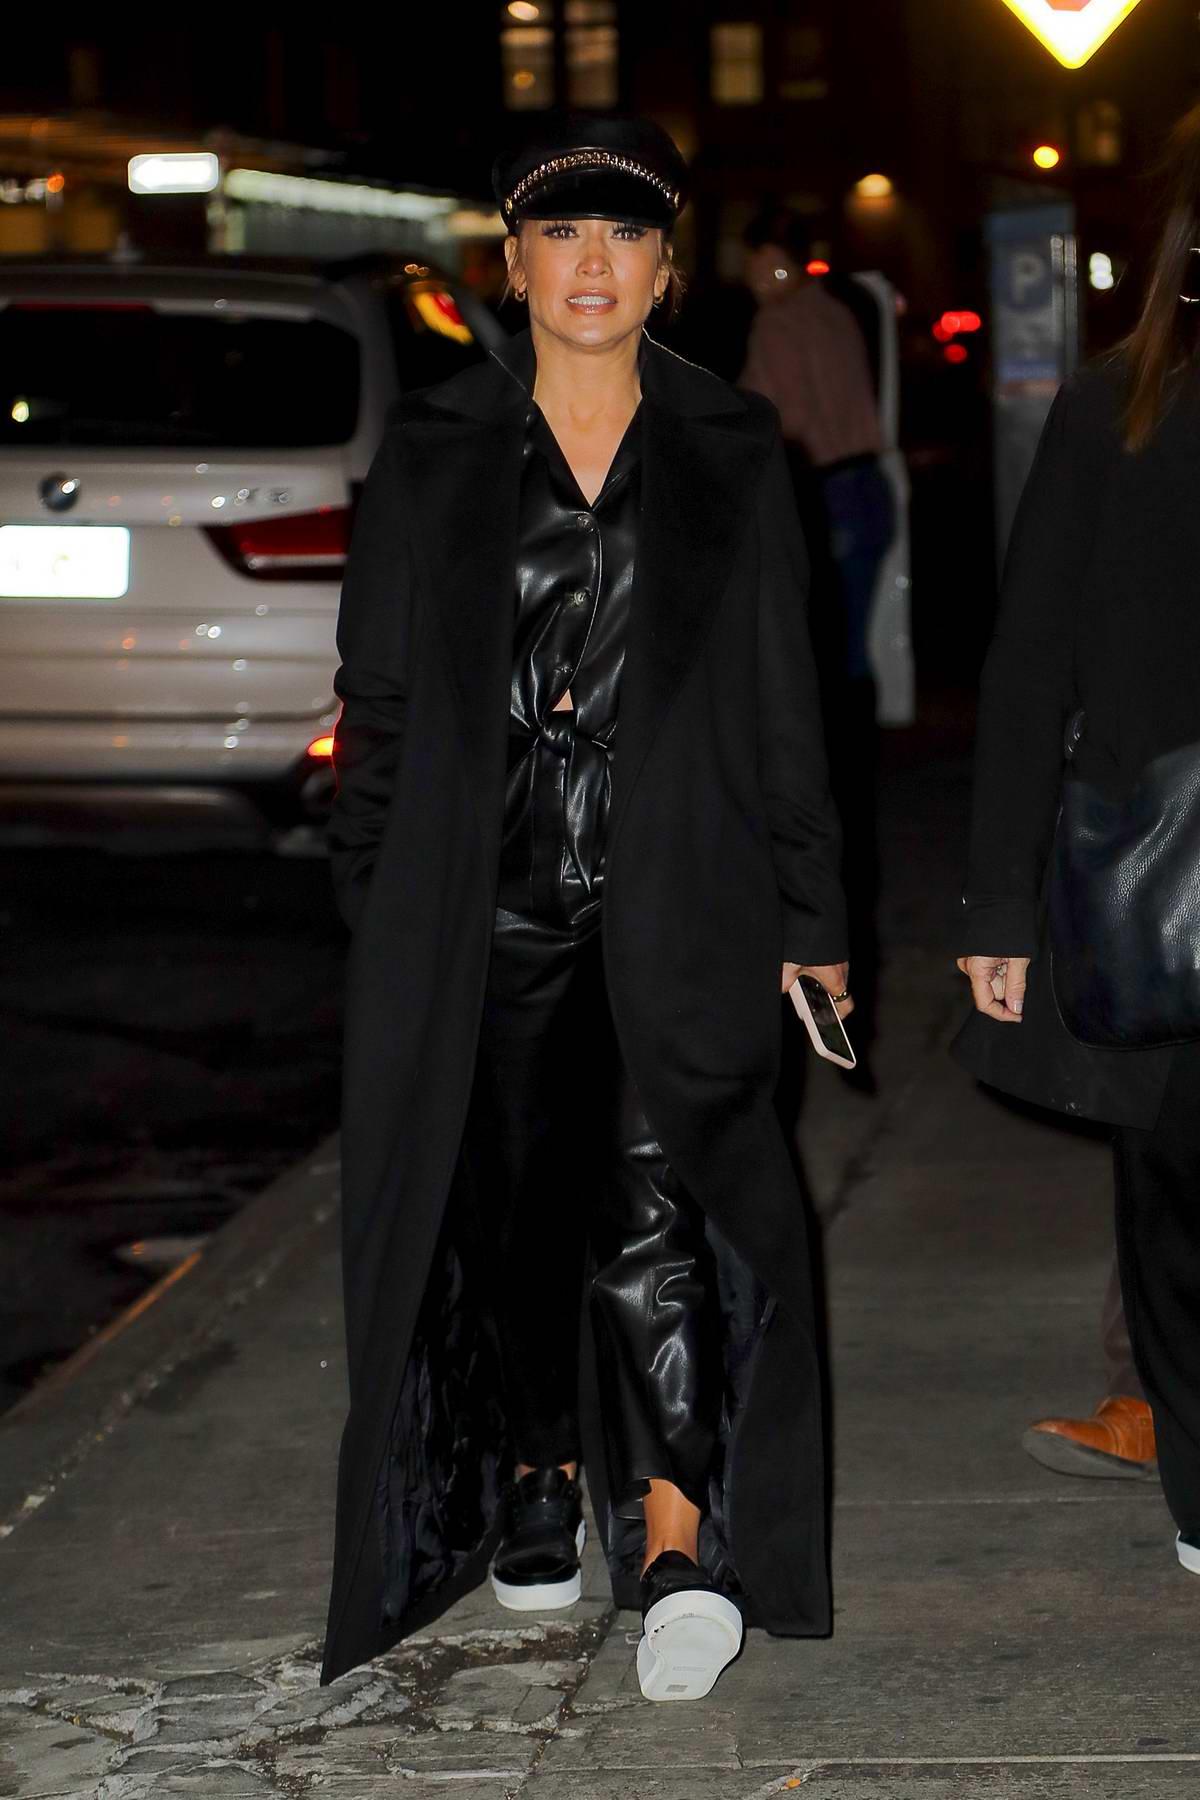 Jennifer Lopez sports an all-black ensemble as she steps out in New York City